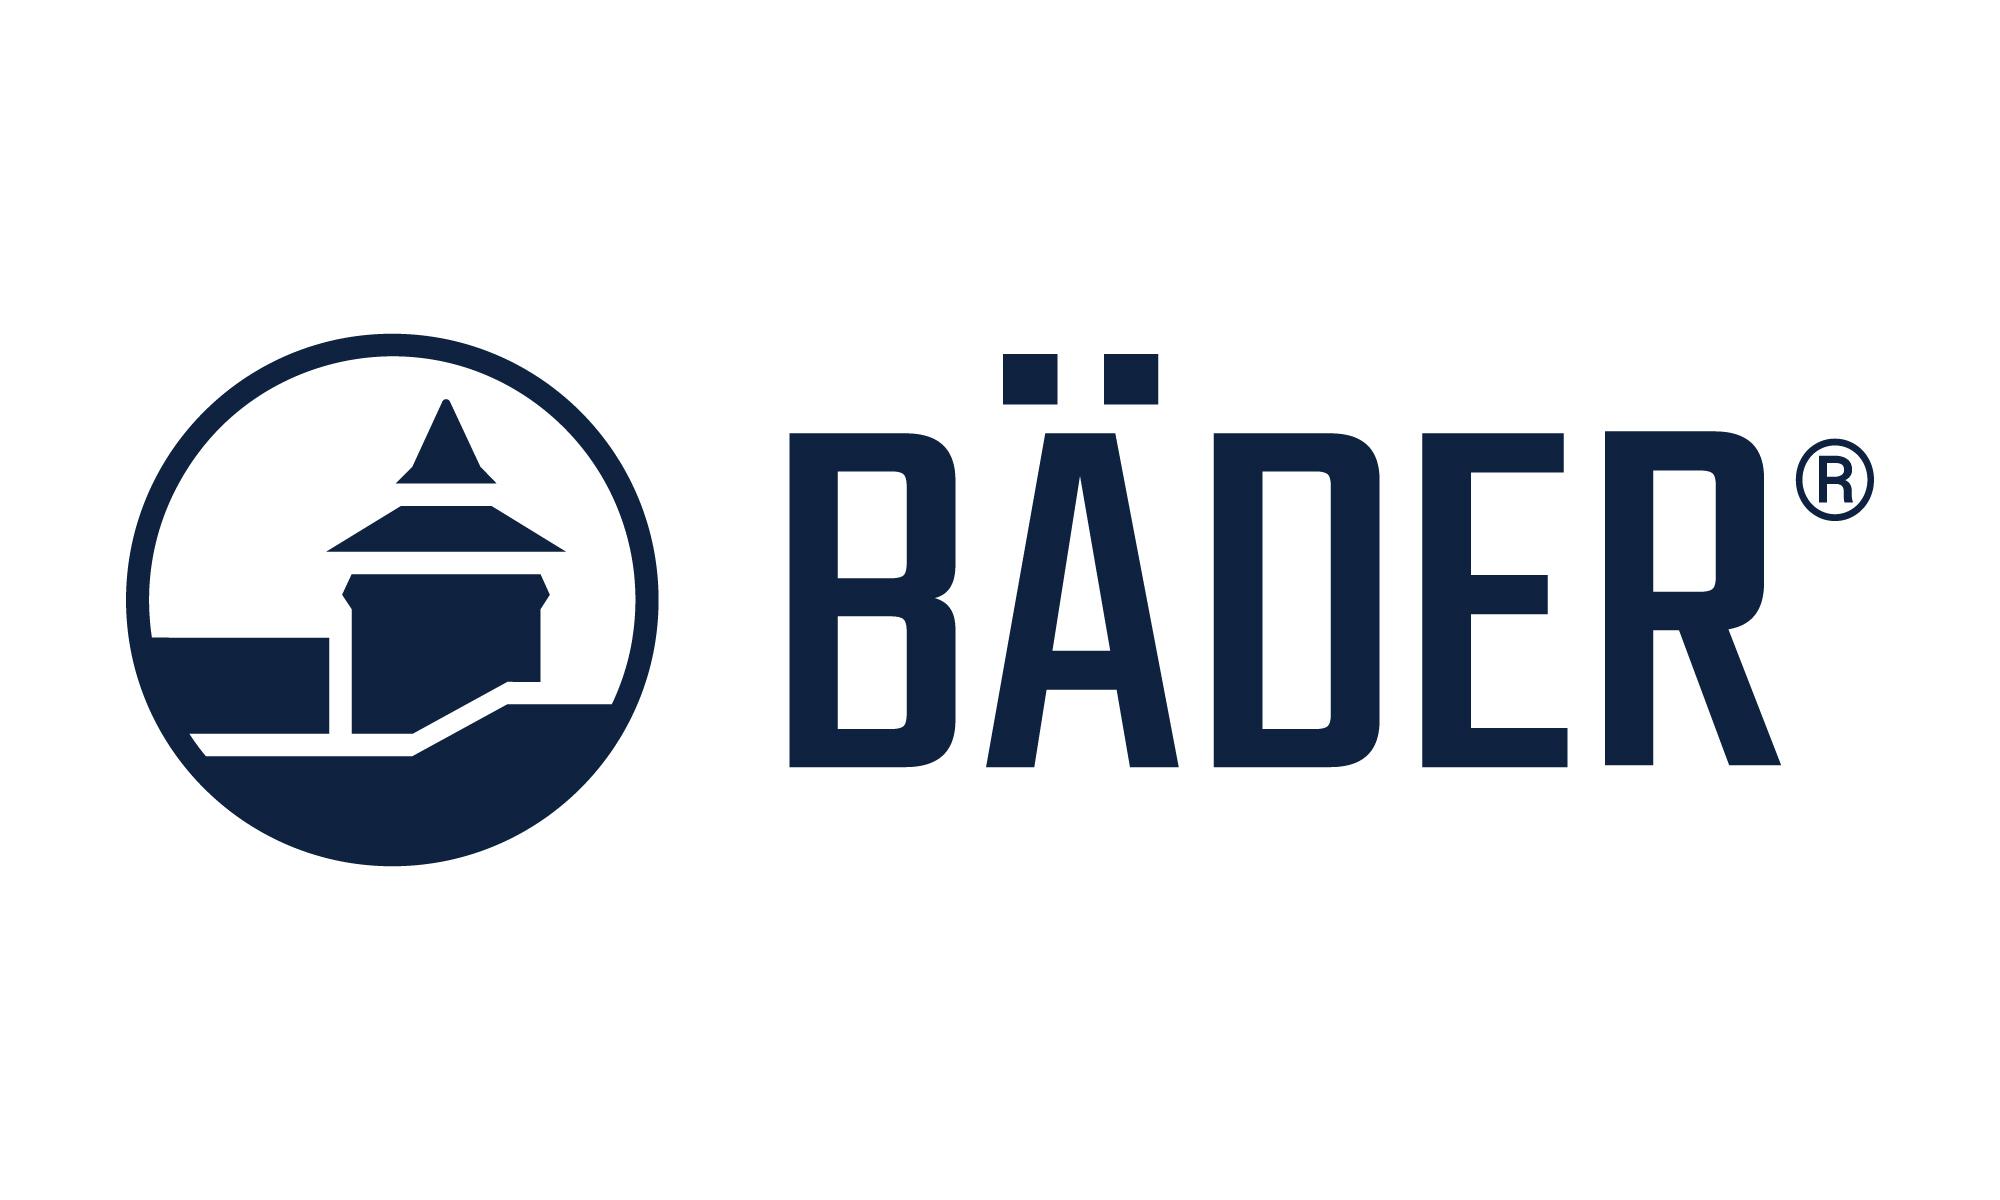 Lackfabrik Bäder GmbH & Co. KG